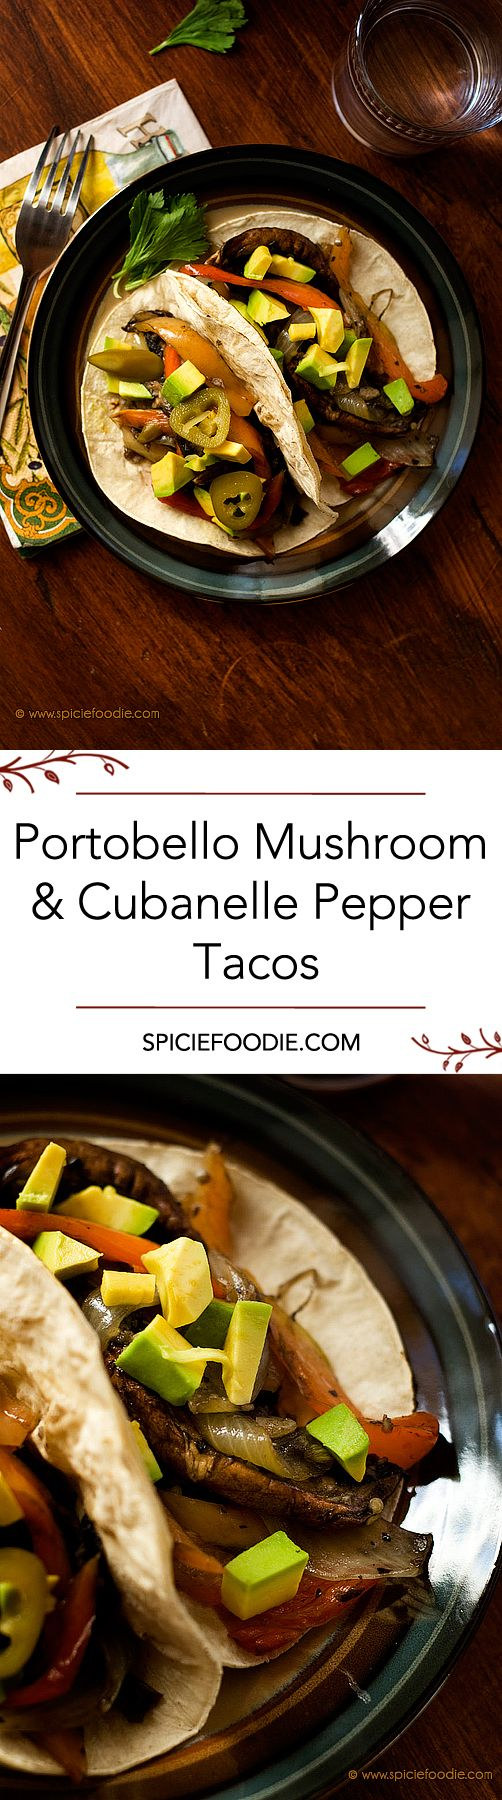 Portobello Mushroom and Cubanelle Pepper Tacos Recipe  | #tacos #vegan |#meatlessmonday